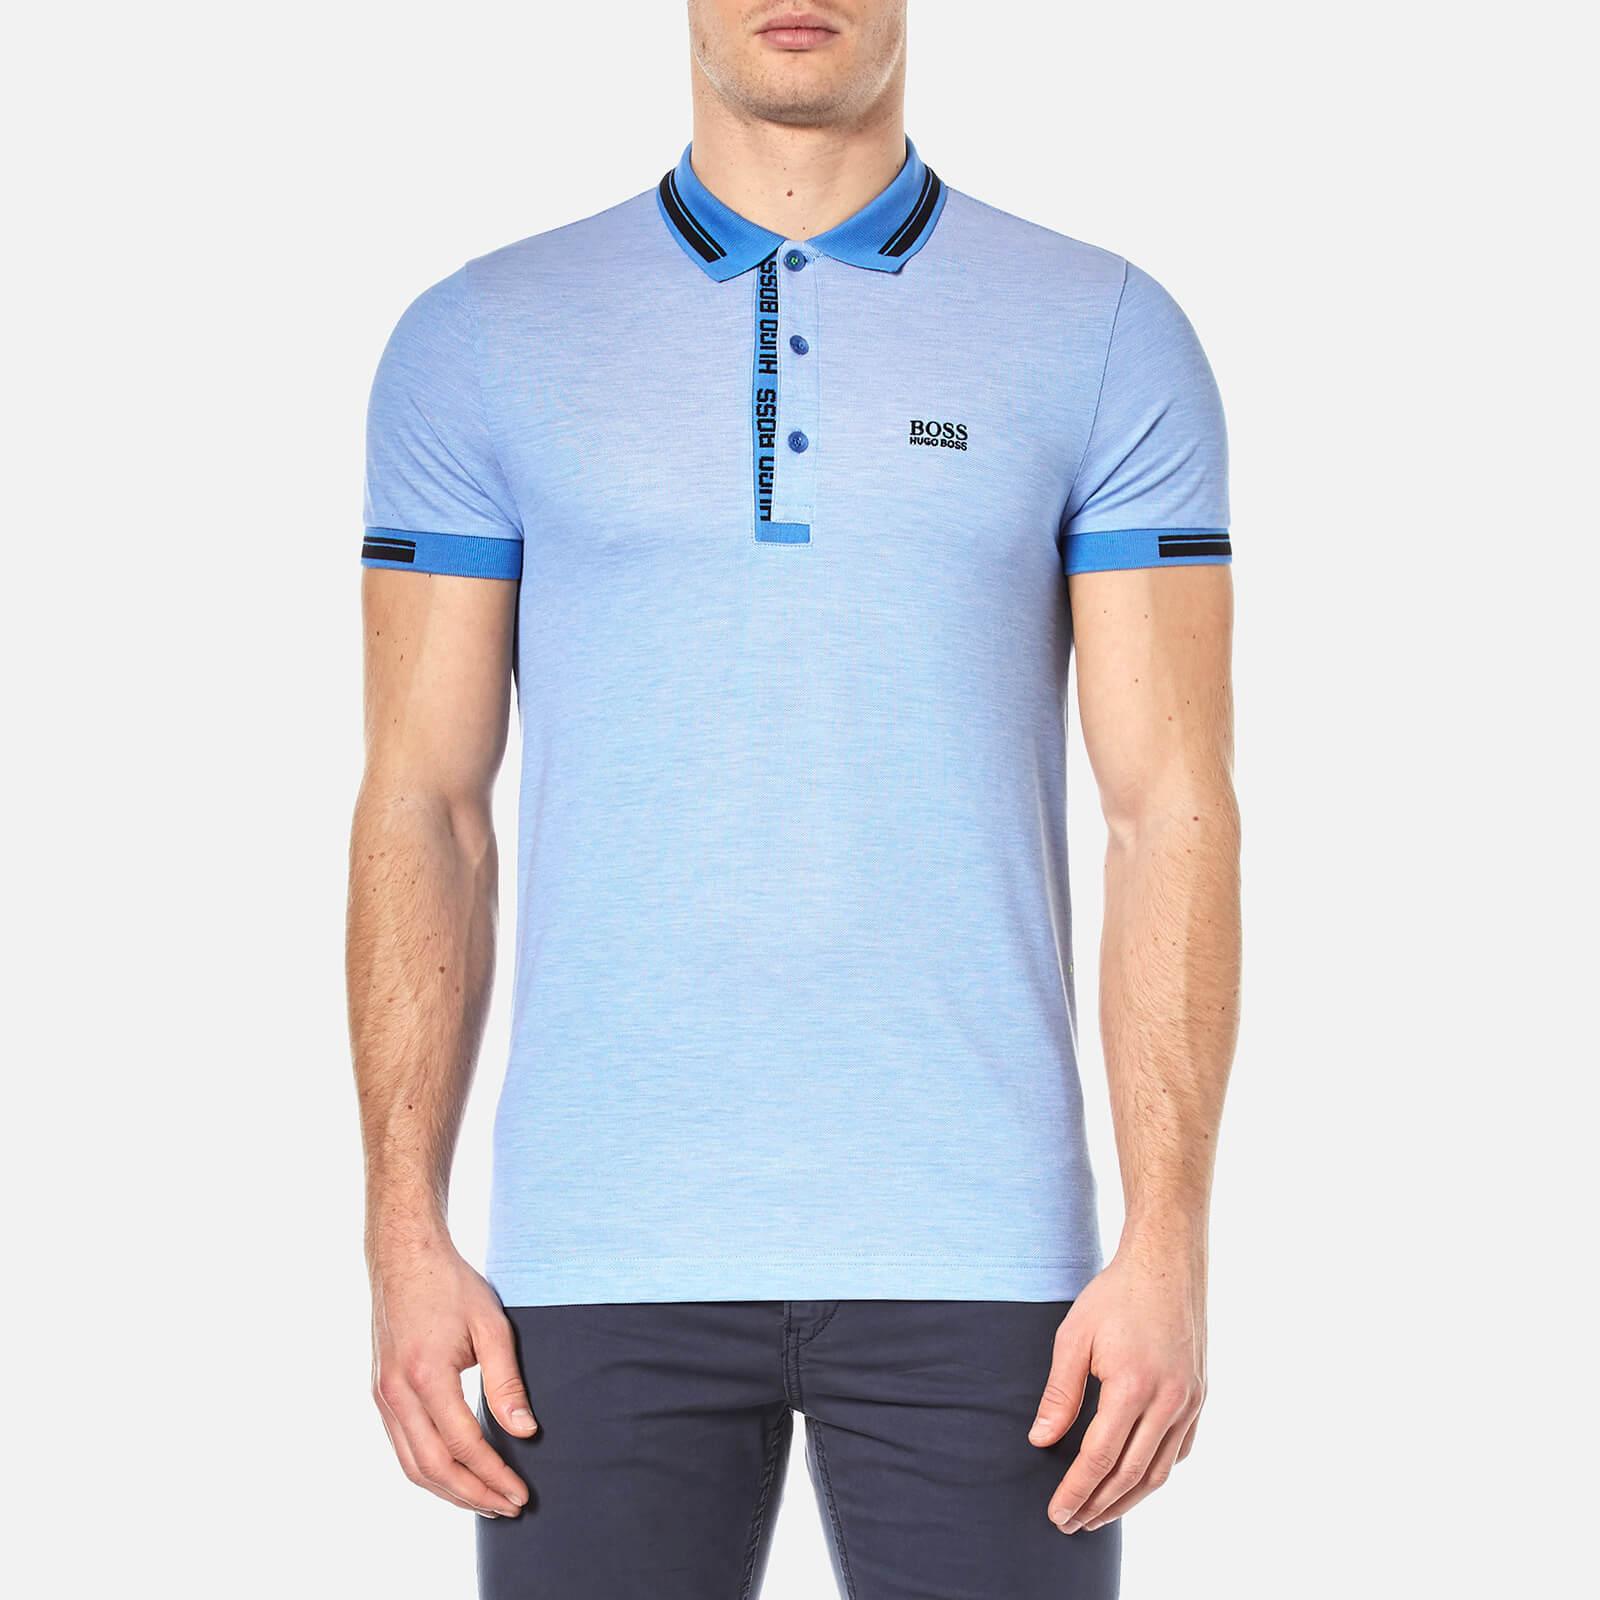 aac66055f BOSS Green Men's Paule 4 Polo Shirt - Medium Blue - Free UK Delivery ...